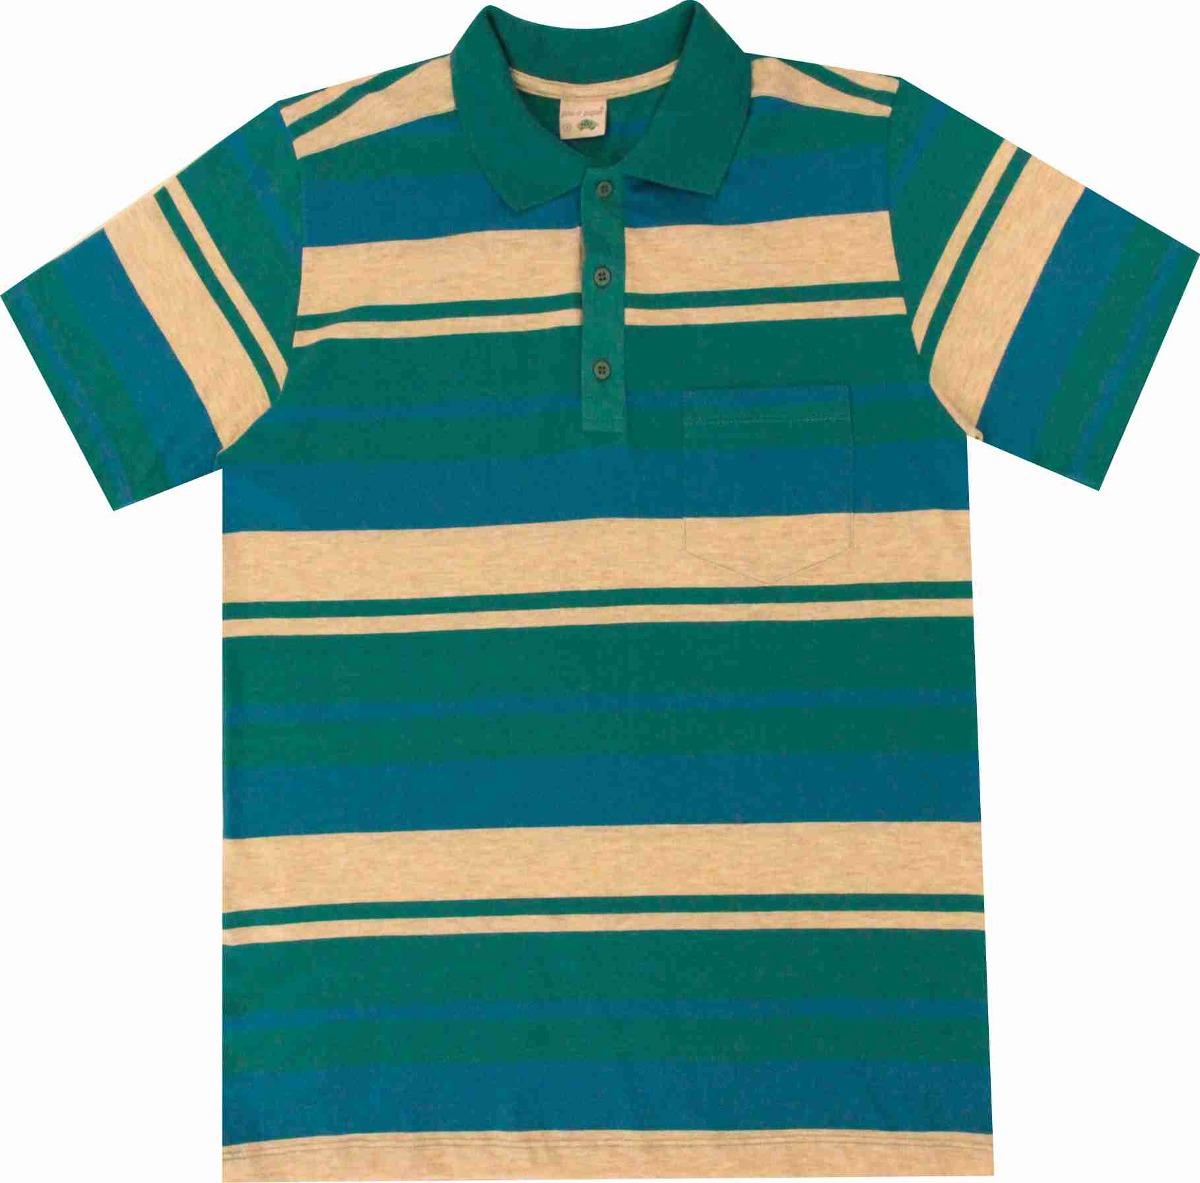 a7706eb223 camisa pau a pique polo turquesa turquesa - p pau a pique. Carregando zoom.